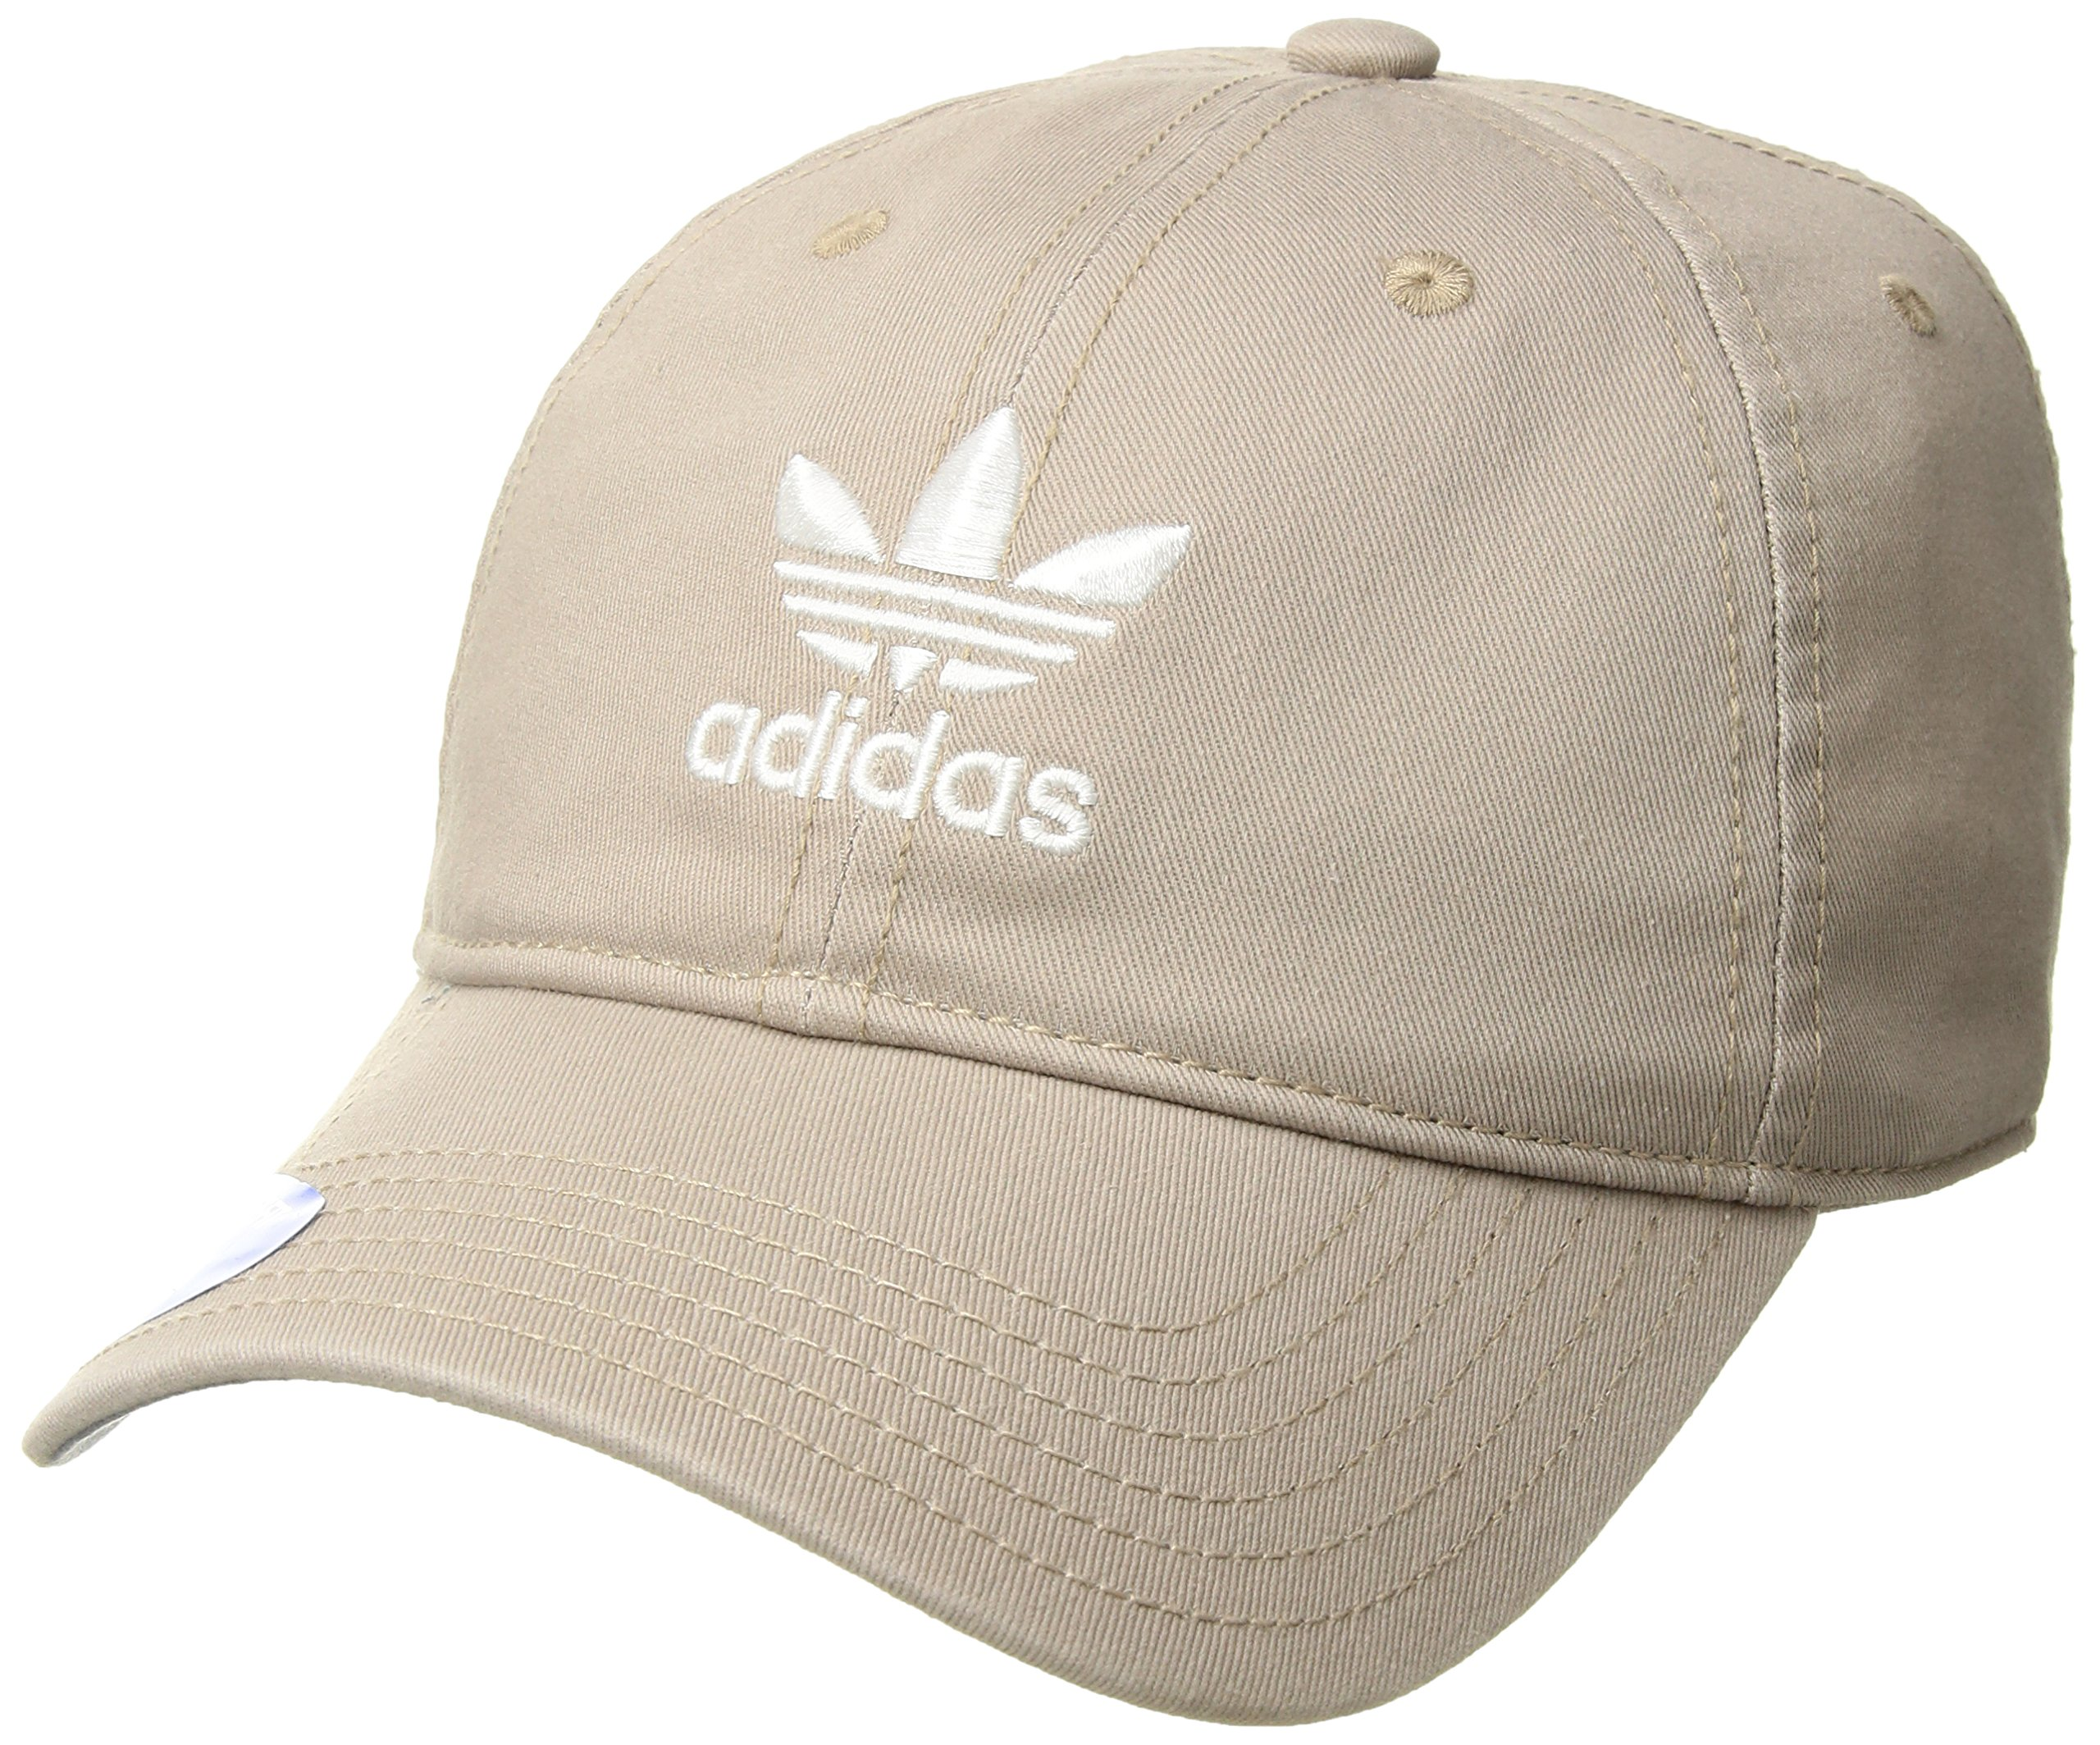 adidas Originals Men's Relaxed Strapback Cap